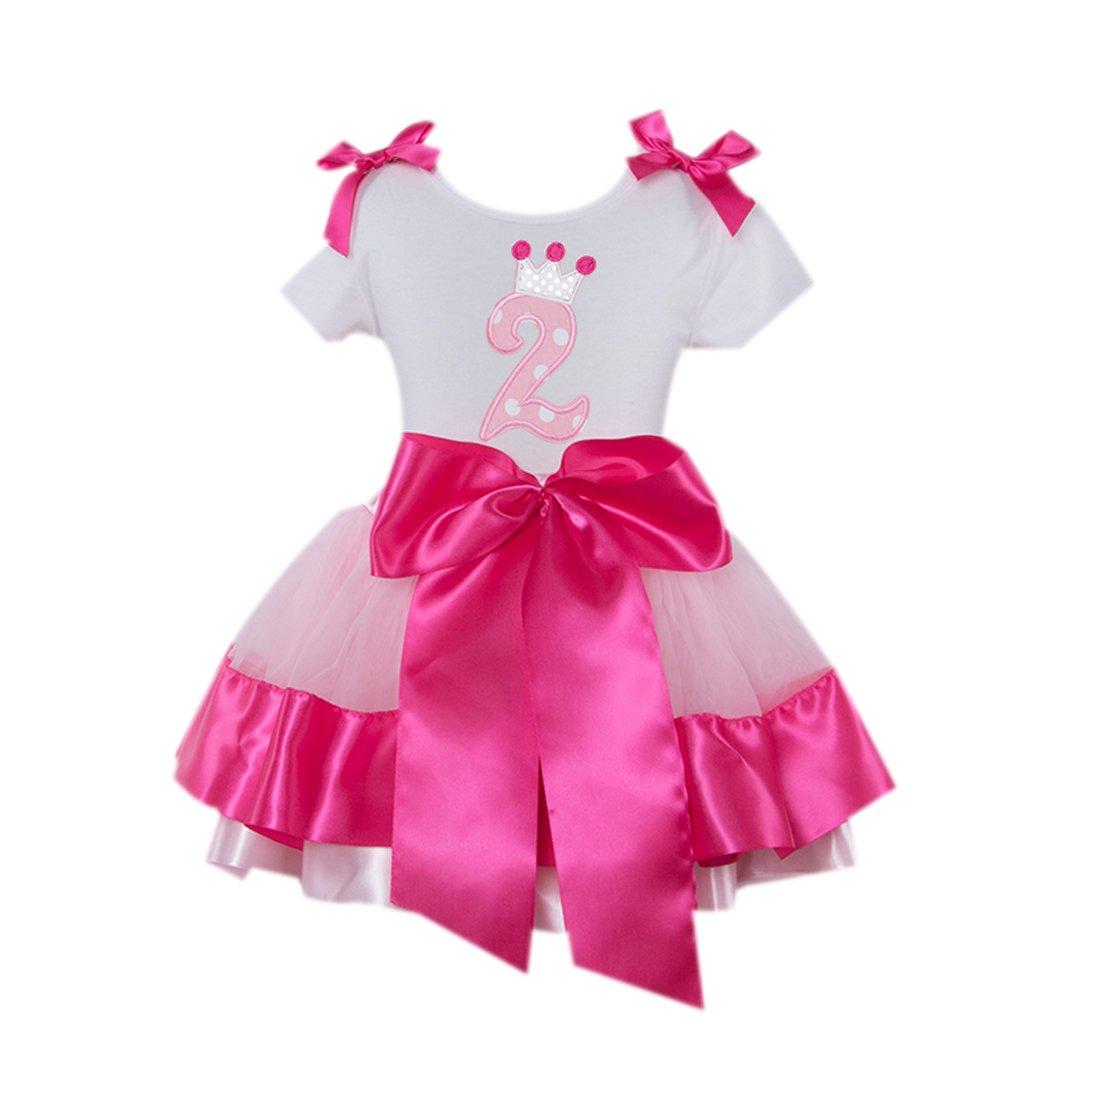 Baby Girls' 2nd White Birthday T-Shirt Pink Rose Satin Skirt For 24M